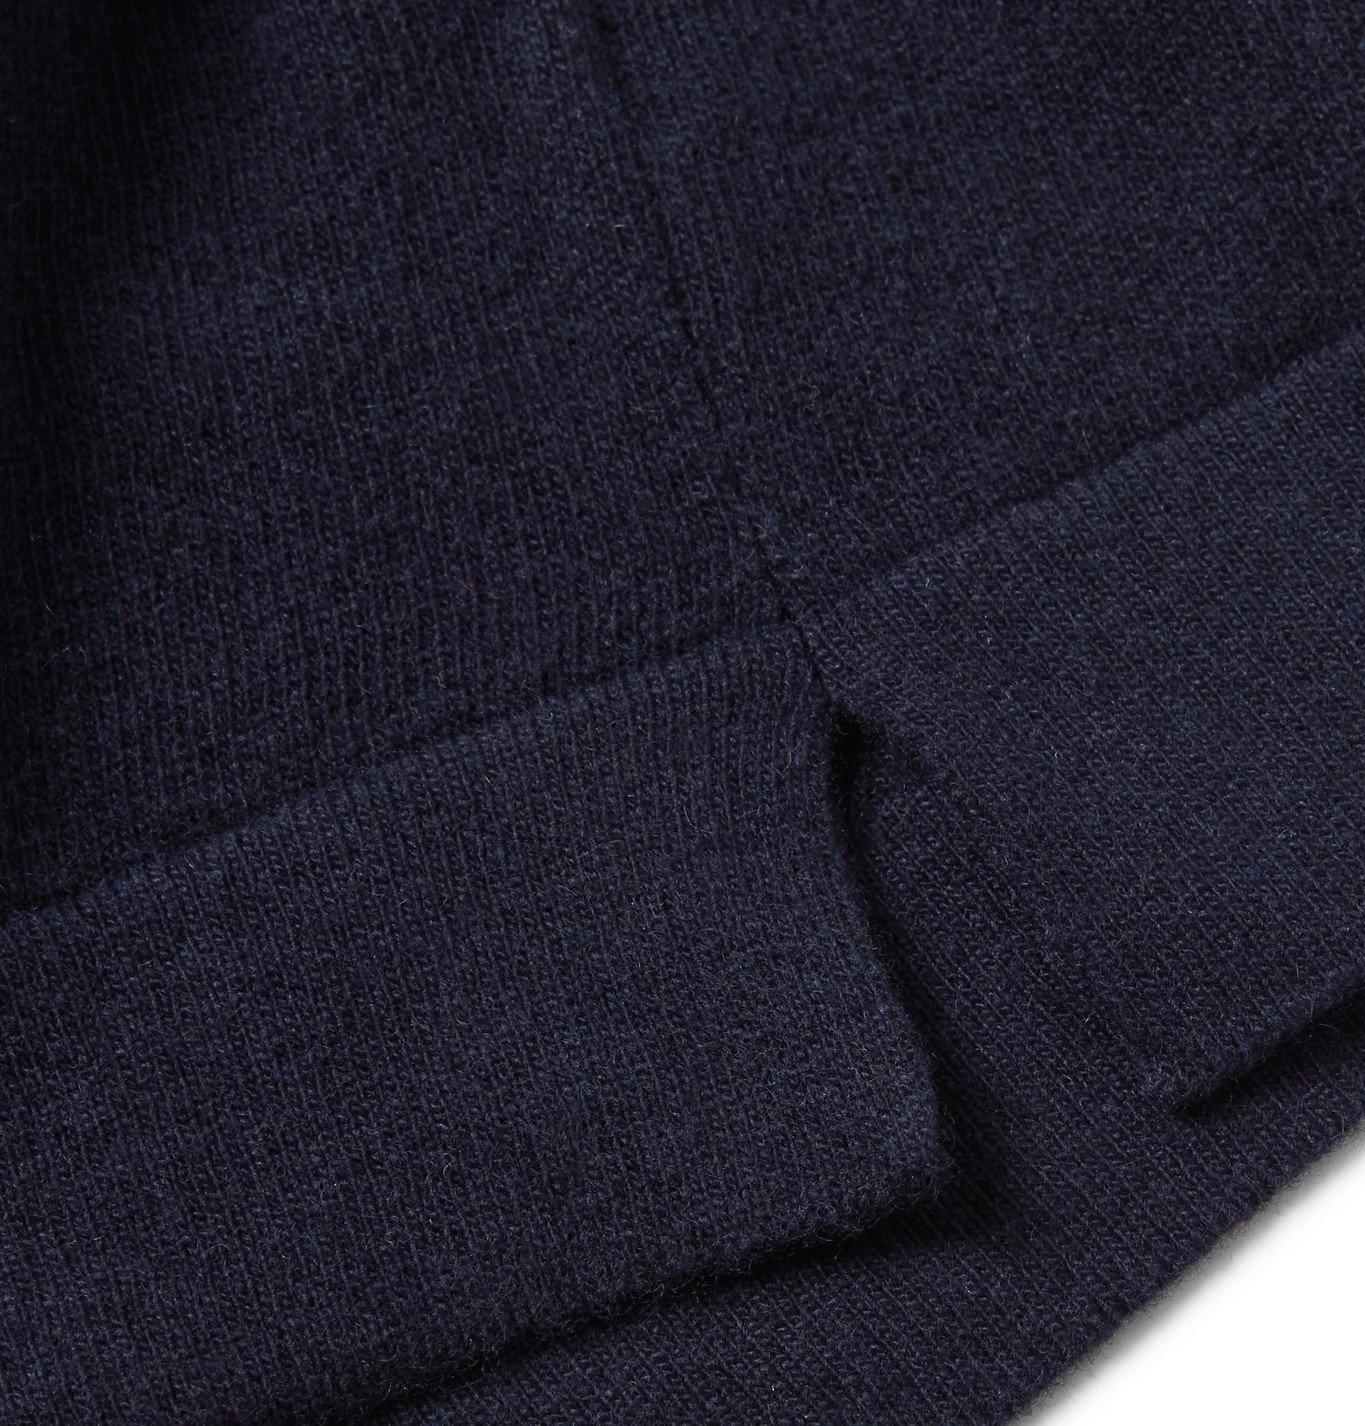 Officine Generale - Nina Cashmere Sweater - Blue